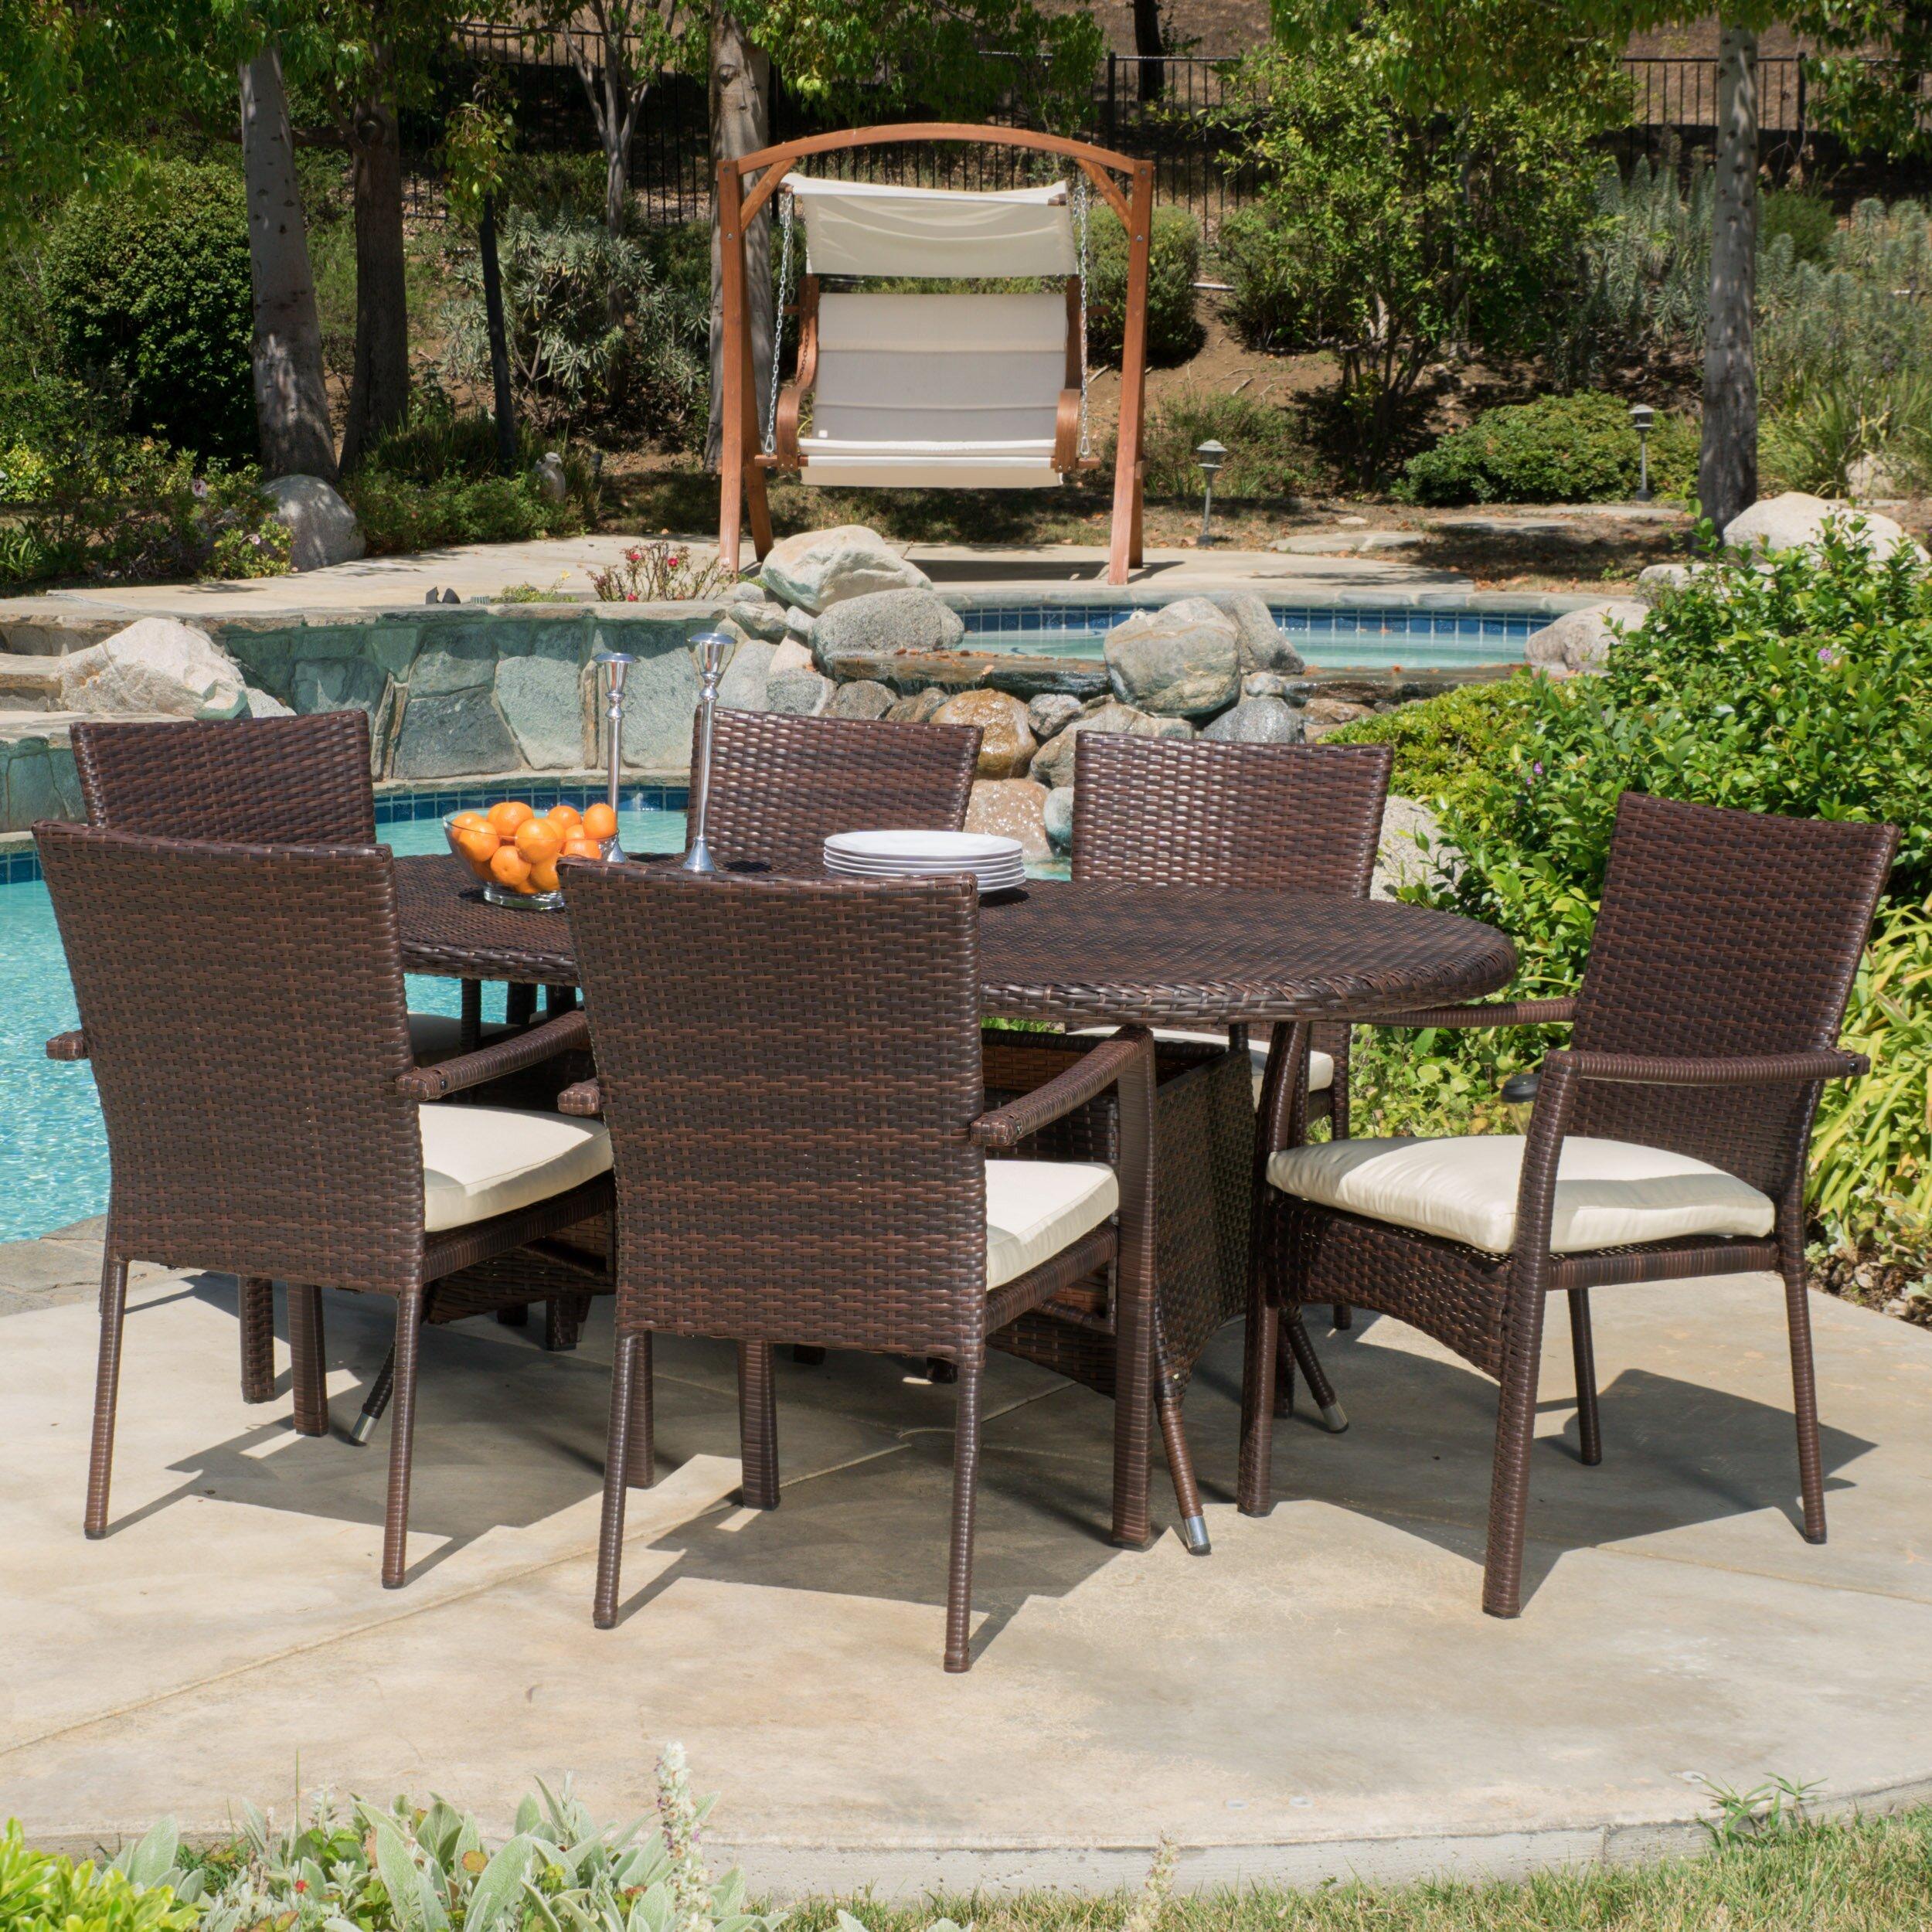 Patio Furniture Brandon Fl: Beachcrest Home Brandon 7 Piece Dining Set With Cushions